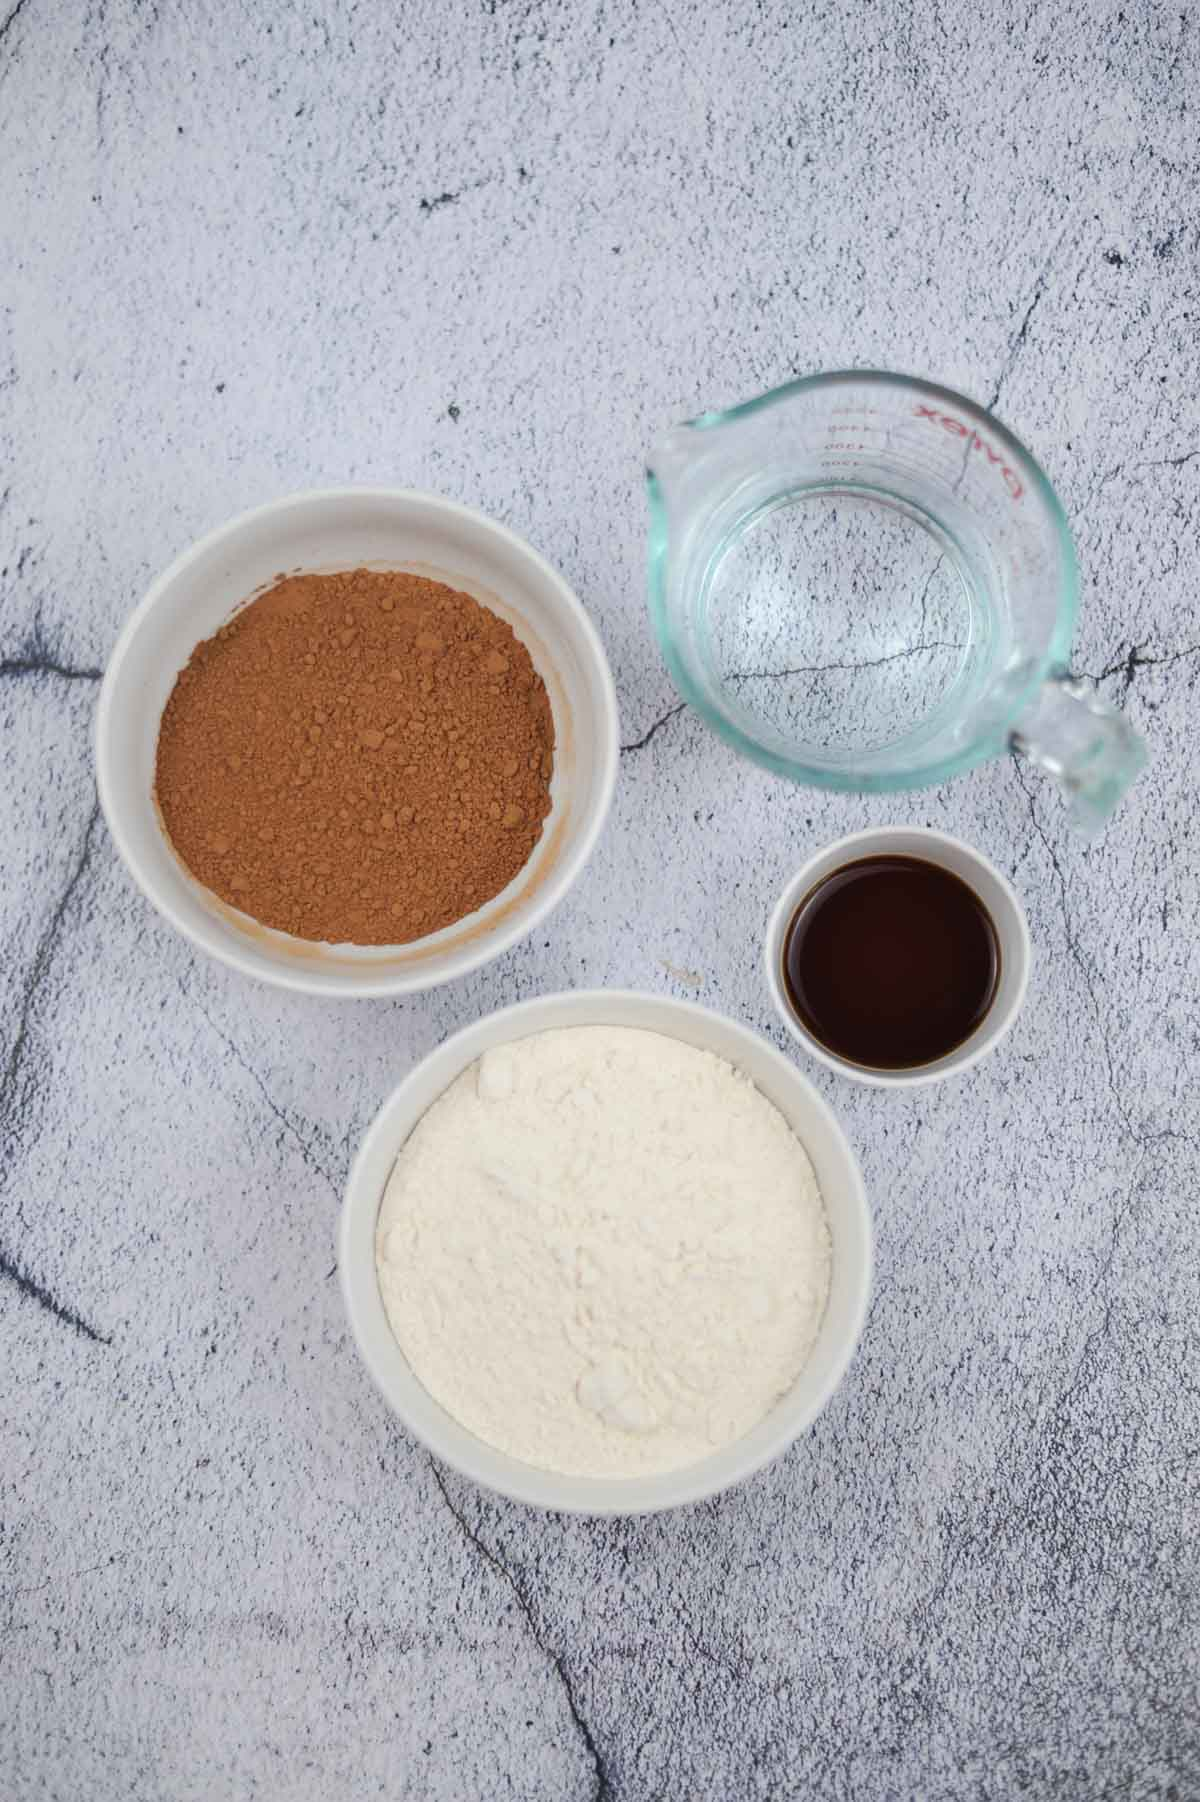 Ingredients to make Halloween pancakes: pancake mix, cocoa, water, vanilla extract.